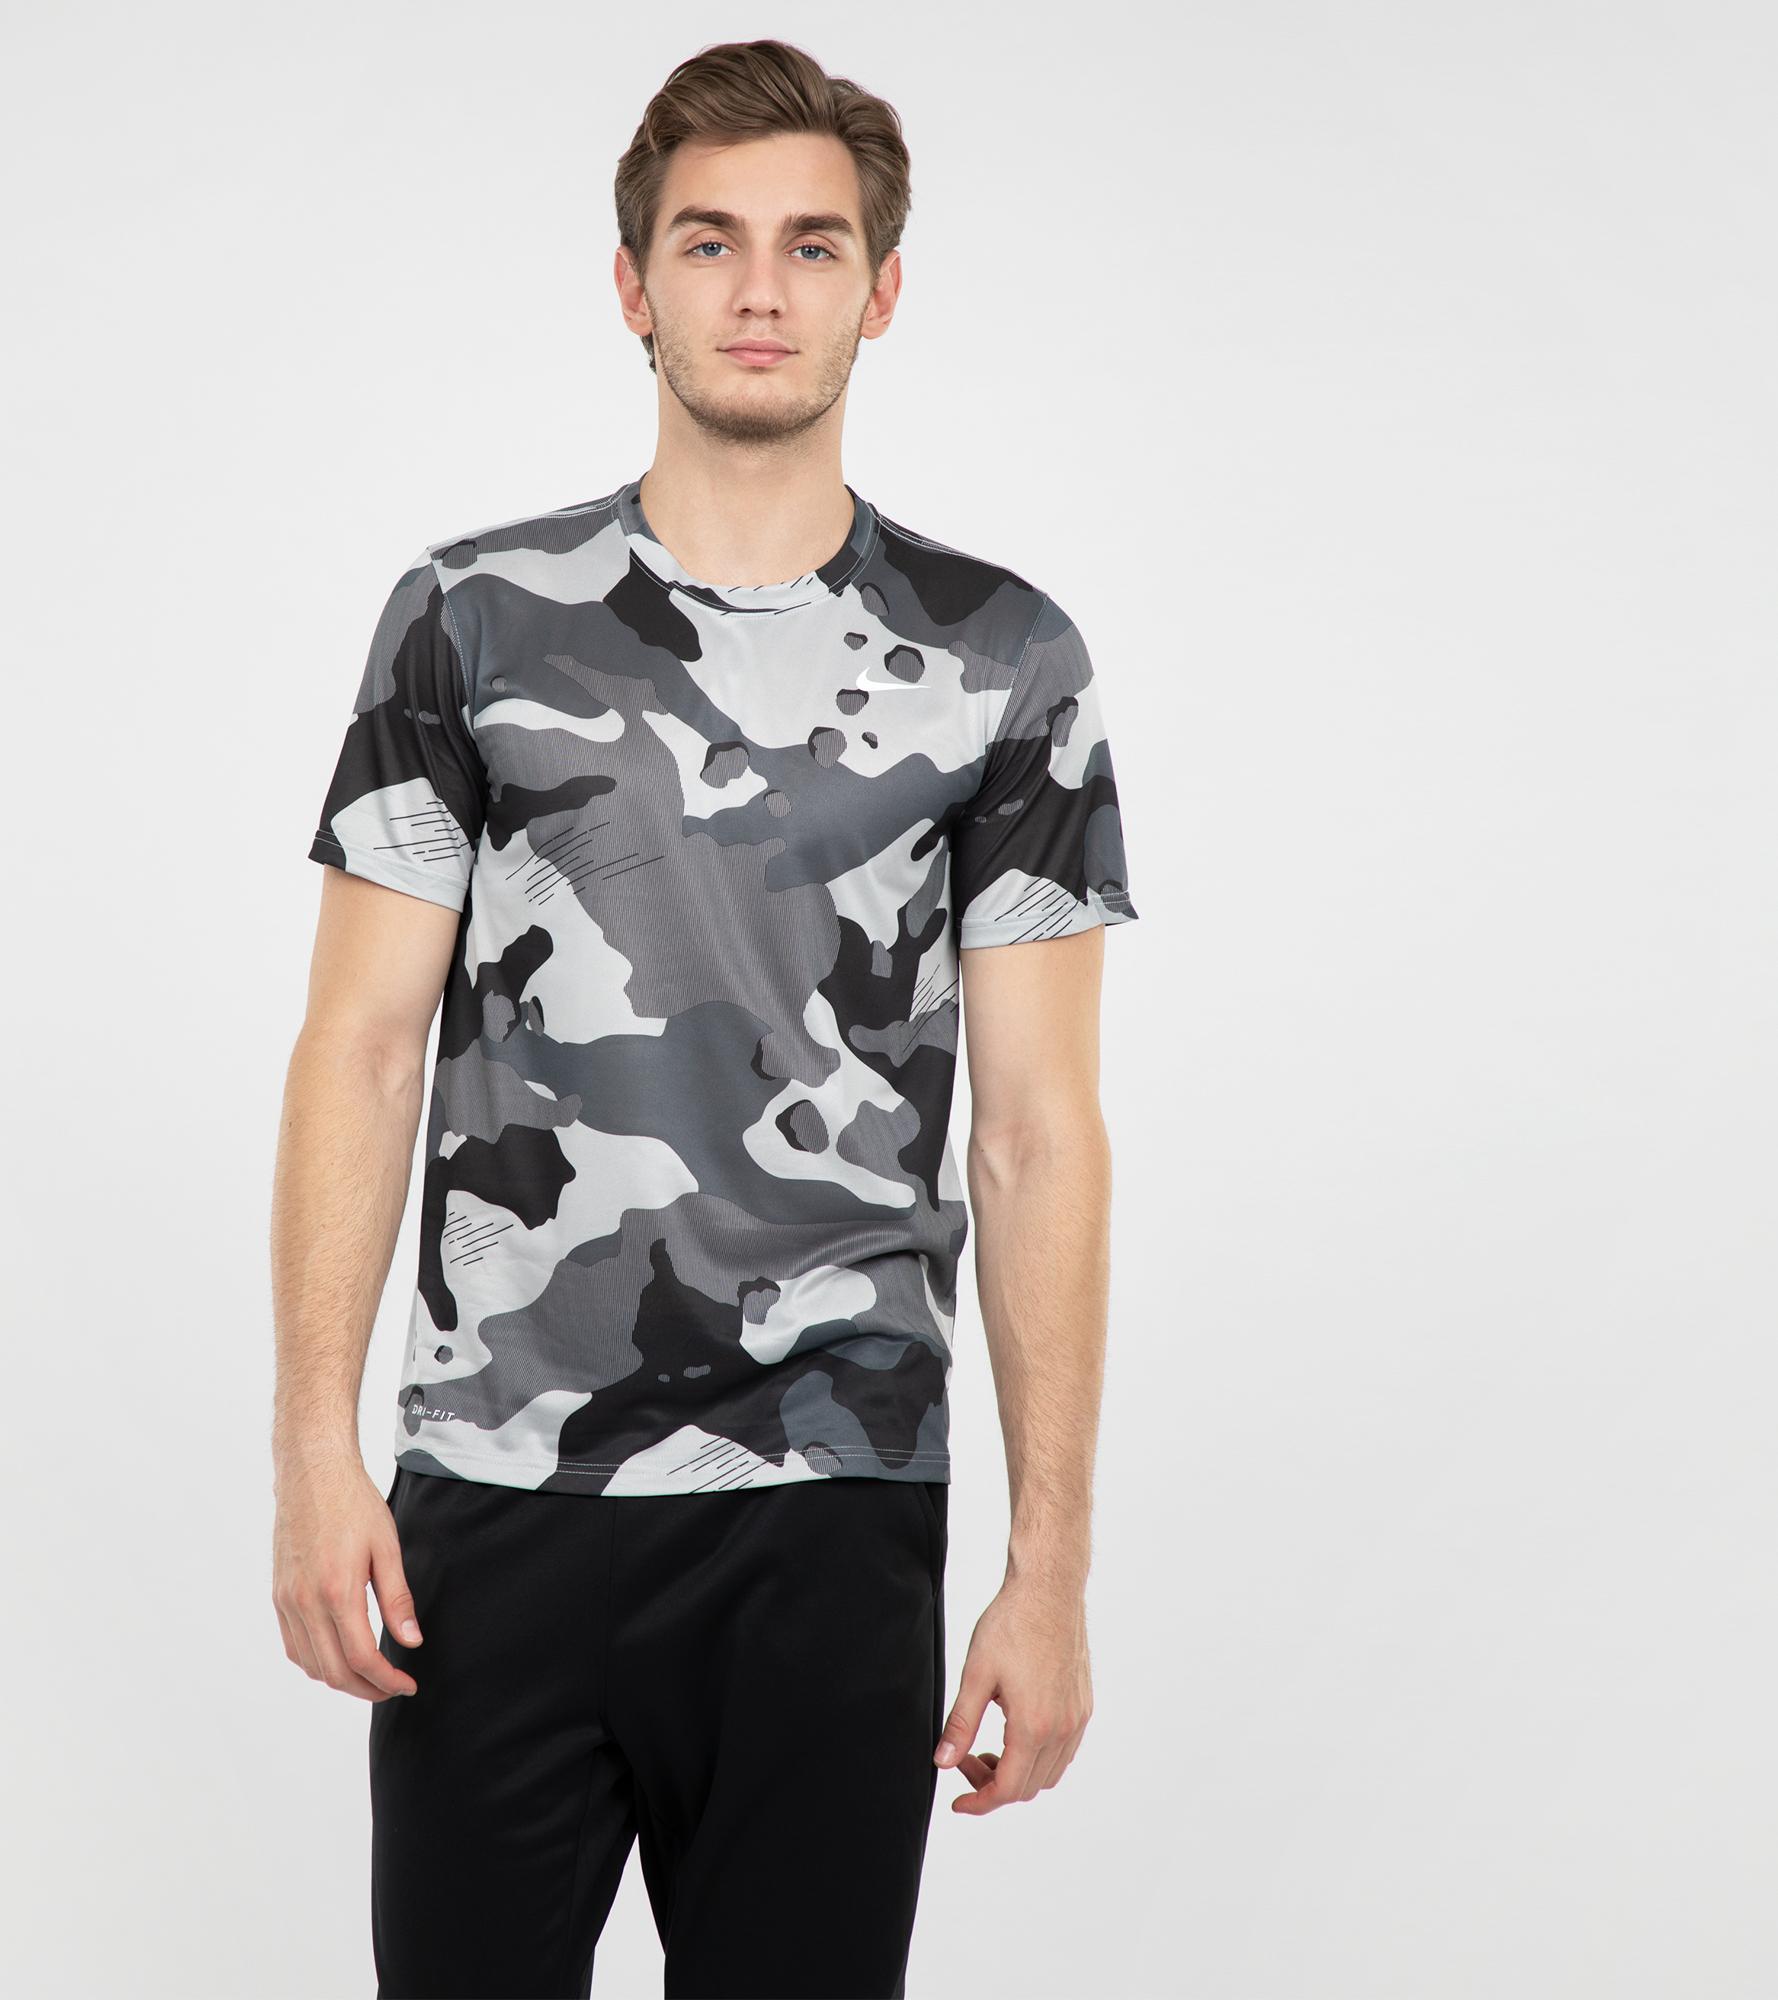 Nike Футболка мужская Nike Dry, размер 52-54 nike футболка мужская nike cool miler